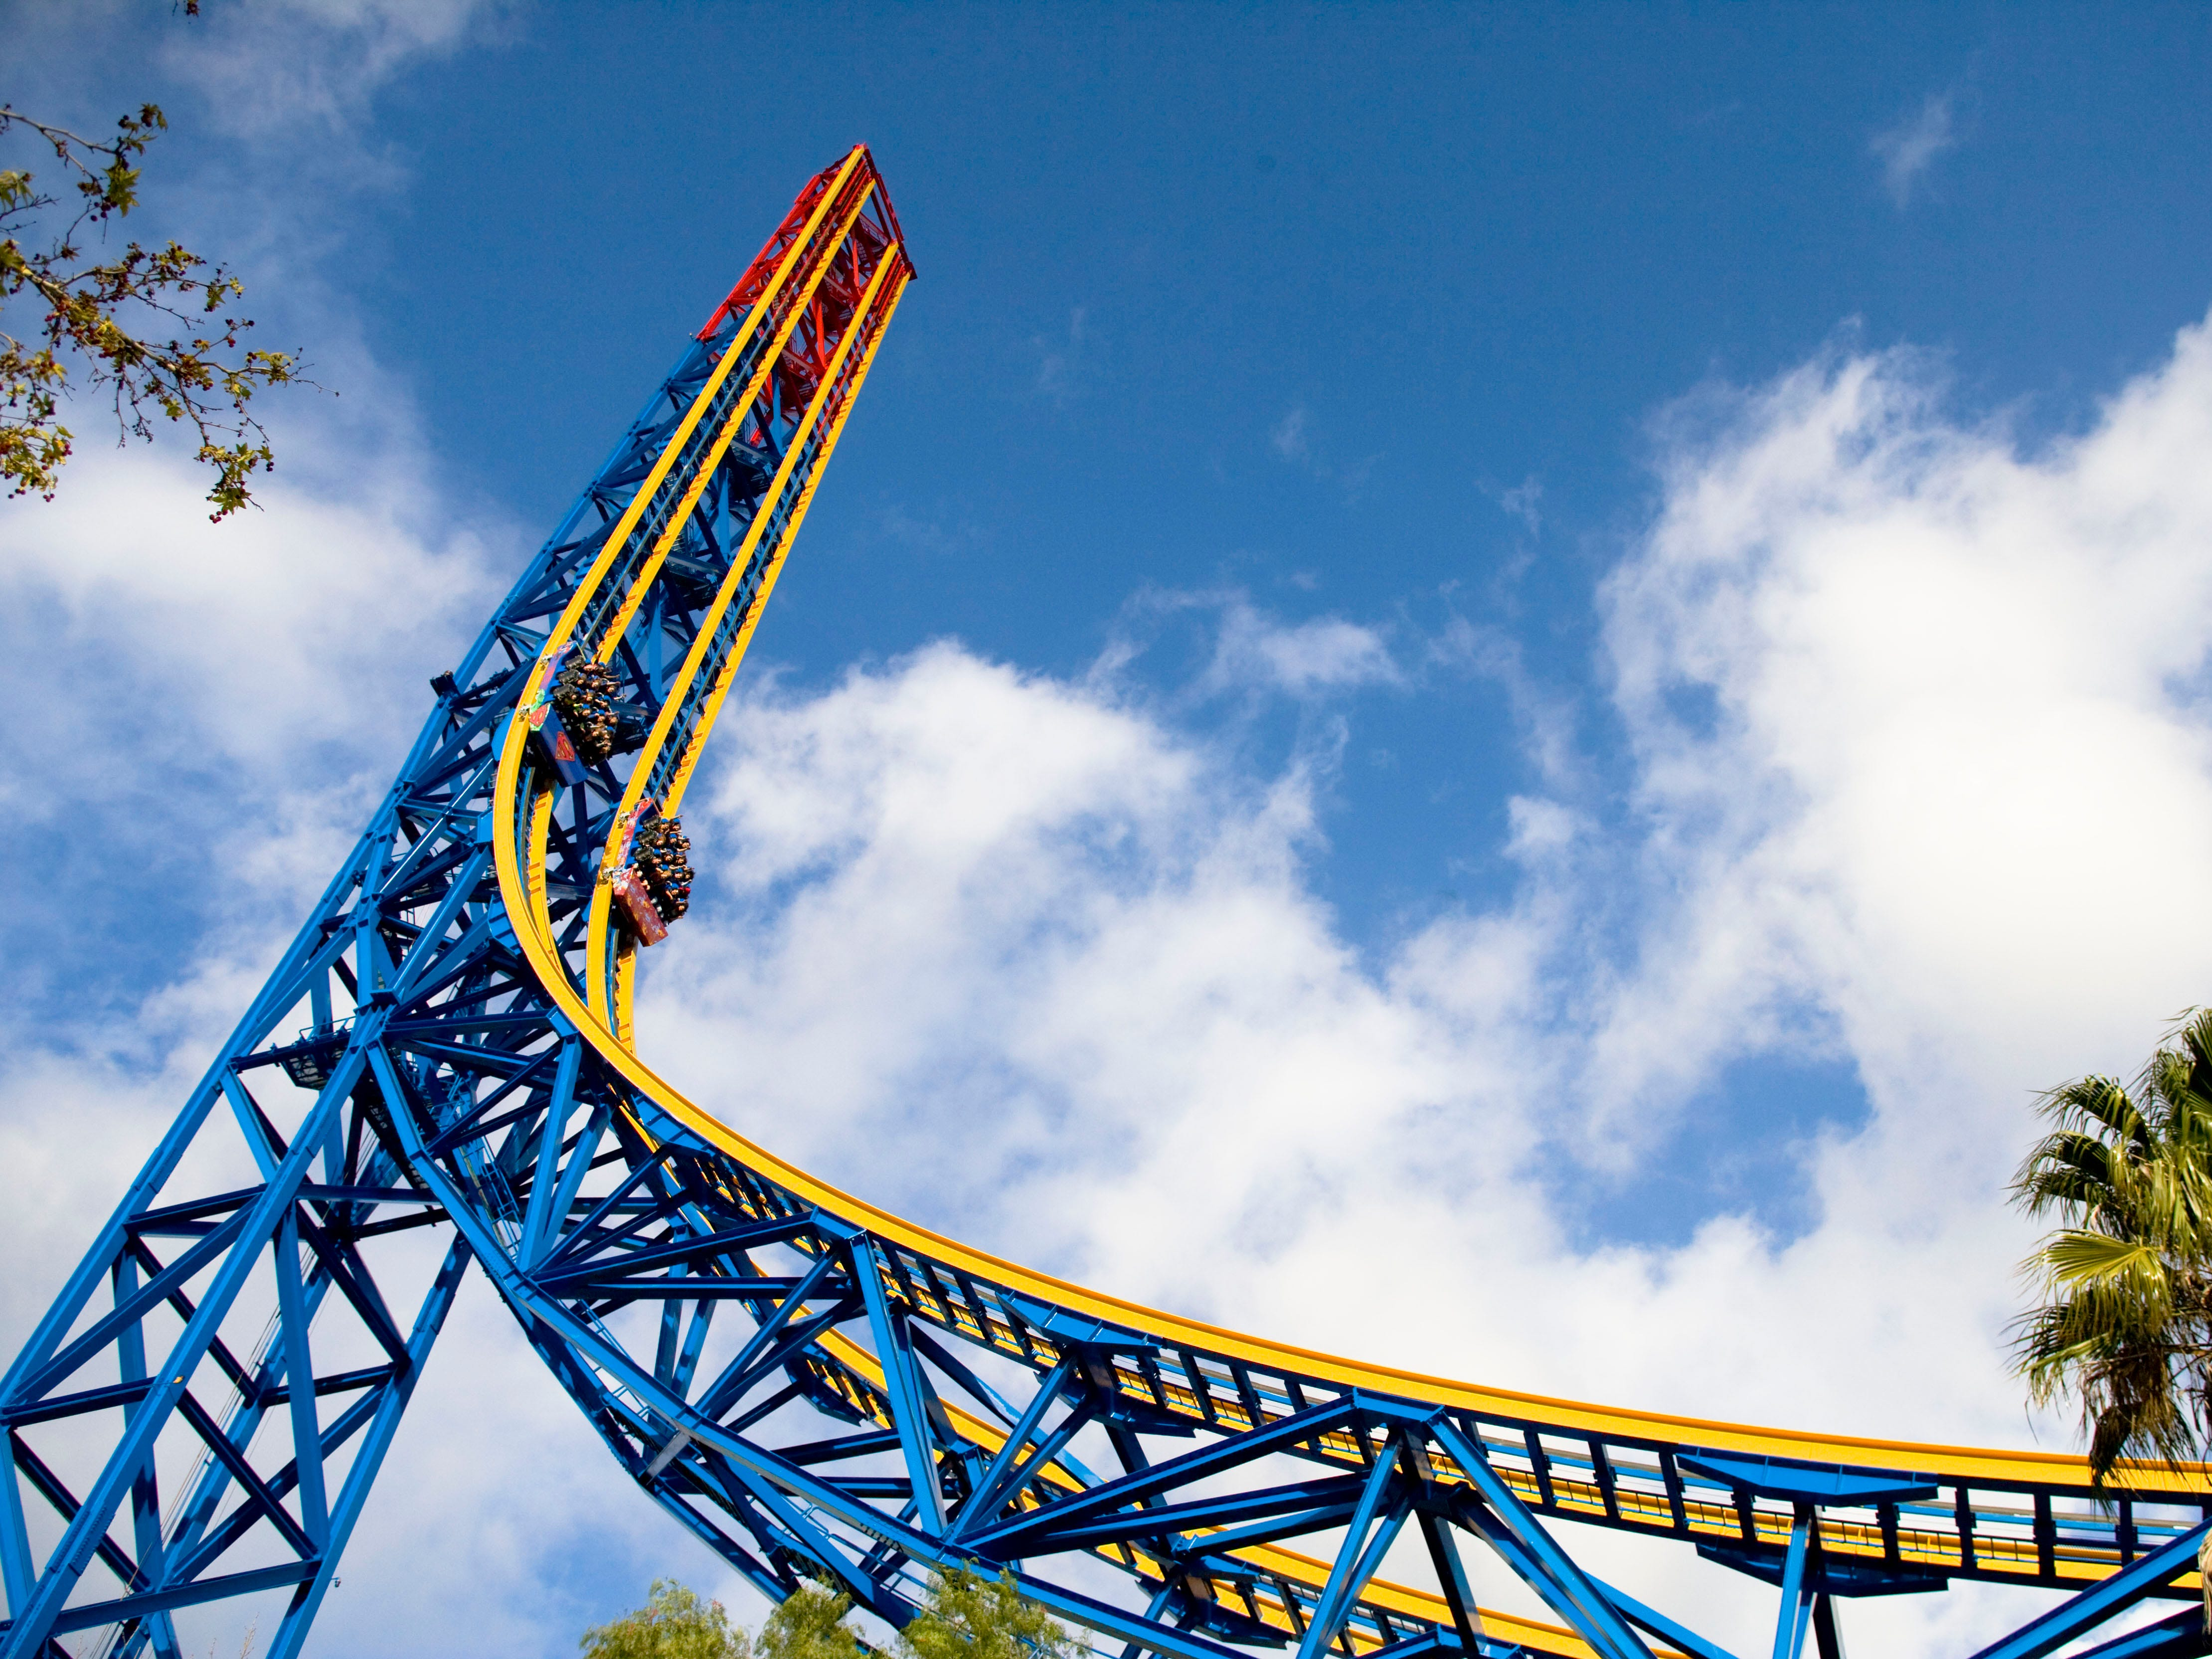 Superman: Escape from Krypton at Six Flags Magic Mountain in Valencia, California.